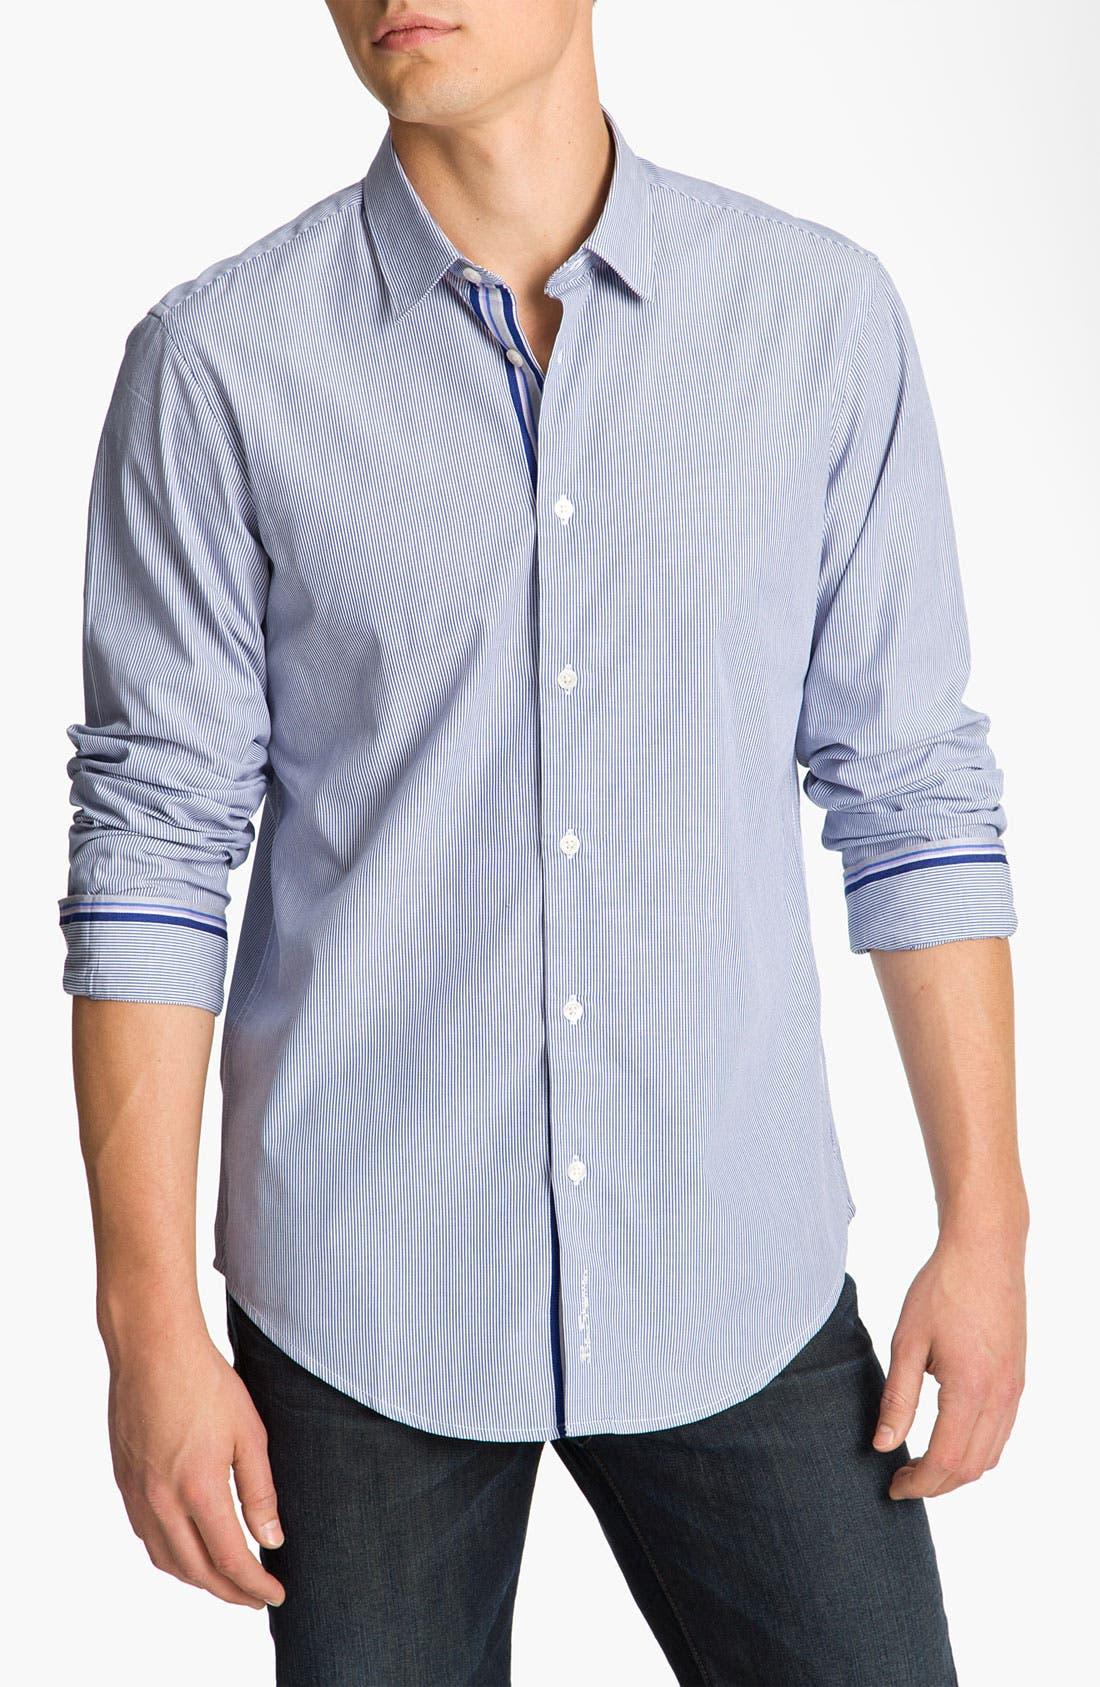 Main Image - Ben Sherman Stripe Woven Shirt